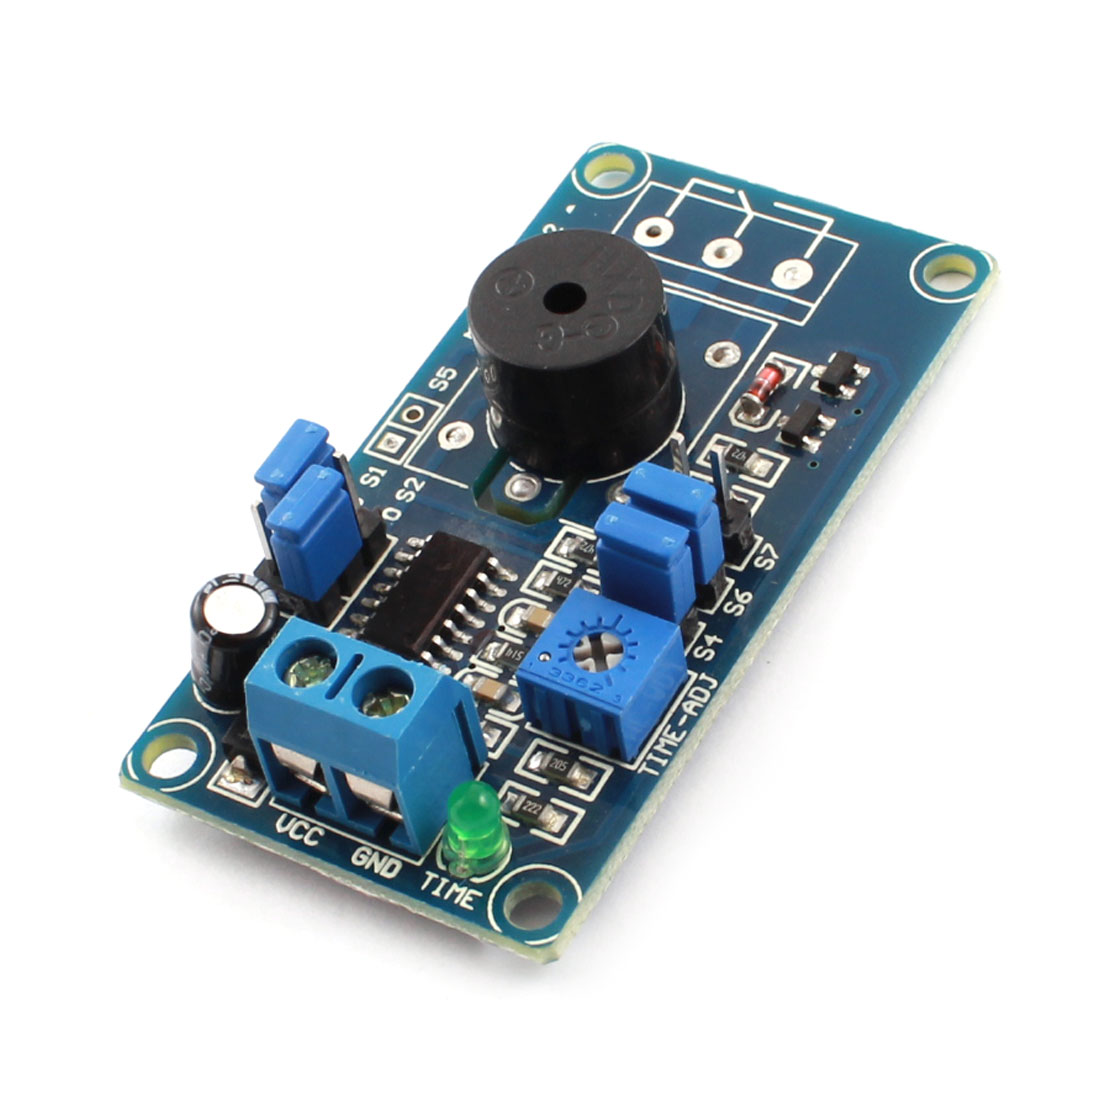 FC-32 DC 5V 85dB Power-On Buzzer Alarm Time Delay PCB Circuit Board Module